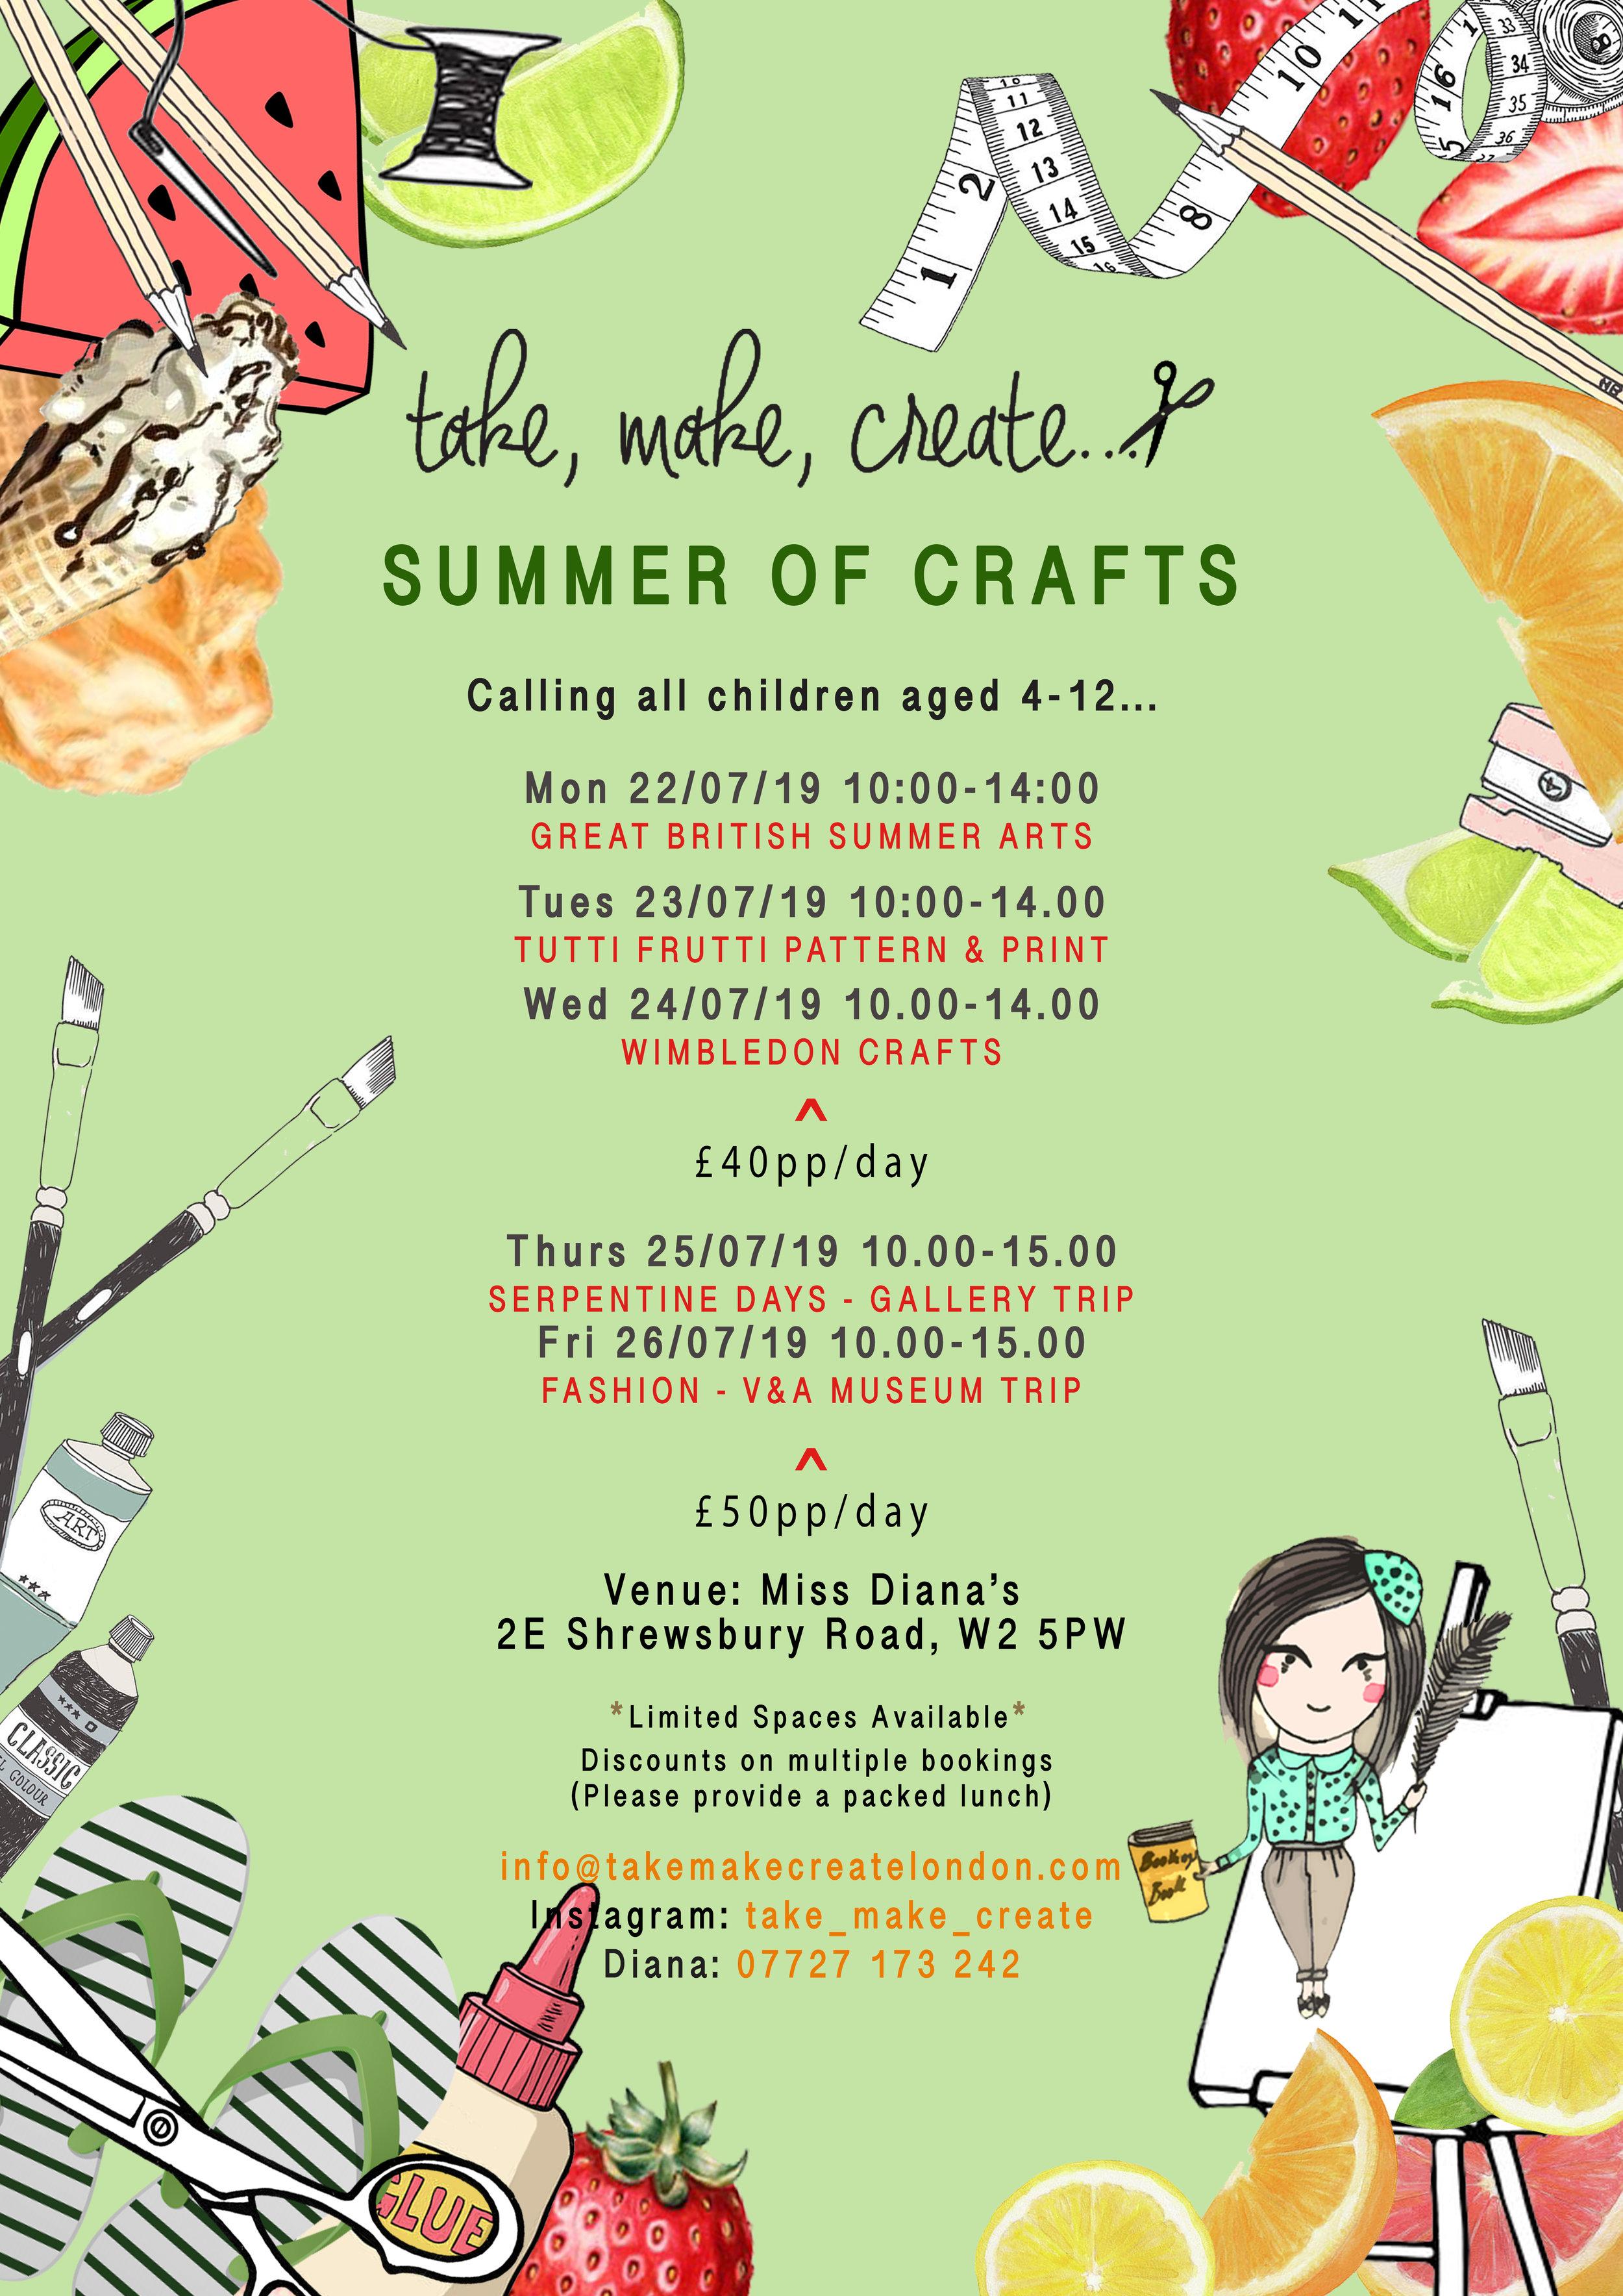 190701- Summer of Crafts Poster copy (1).jpg